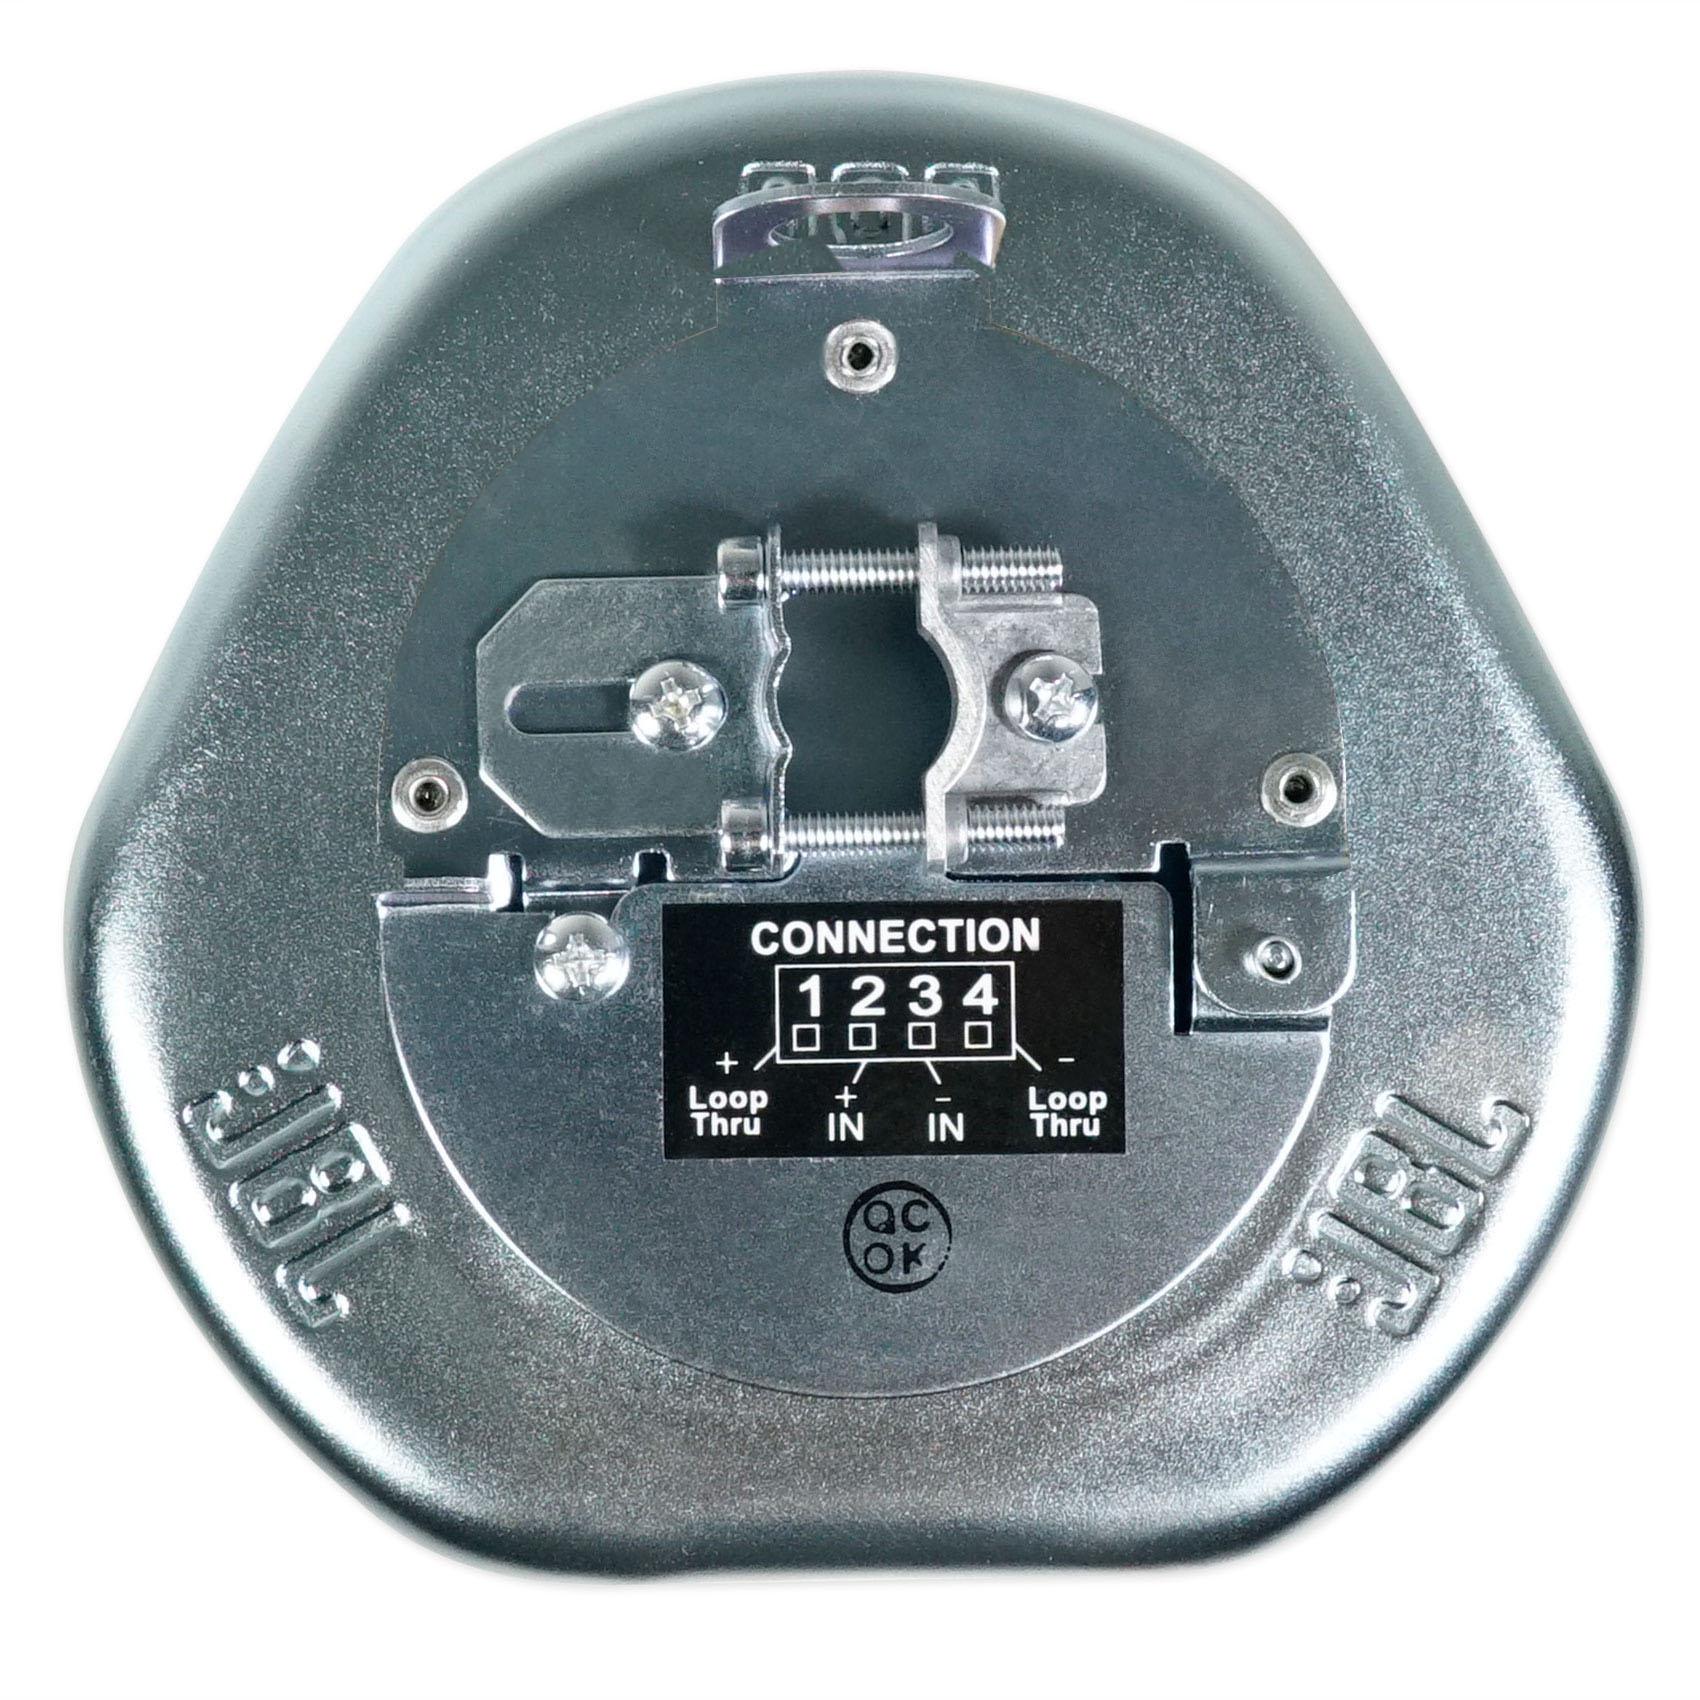 Details about (4) JBL Control 24CT 4